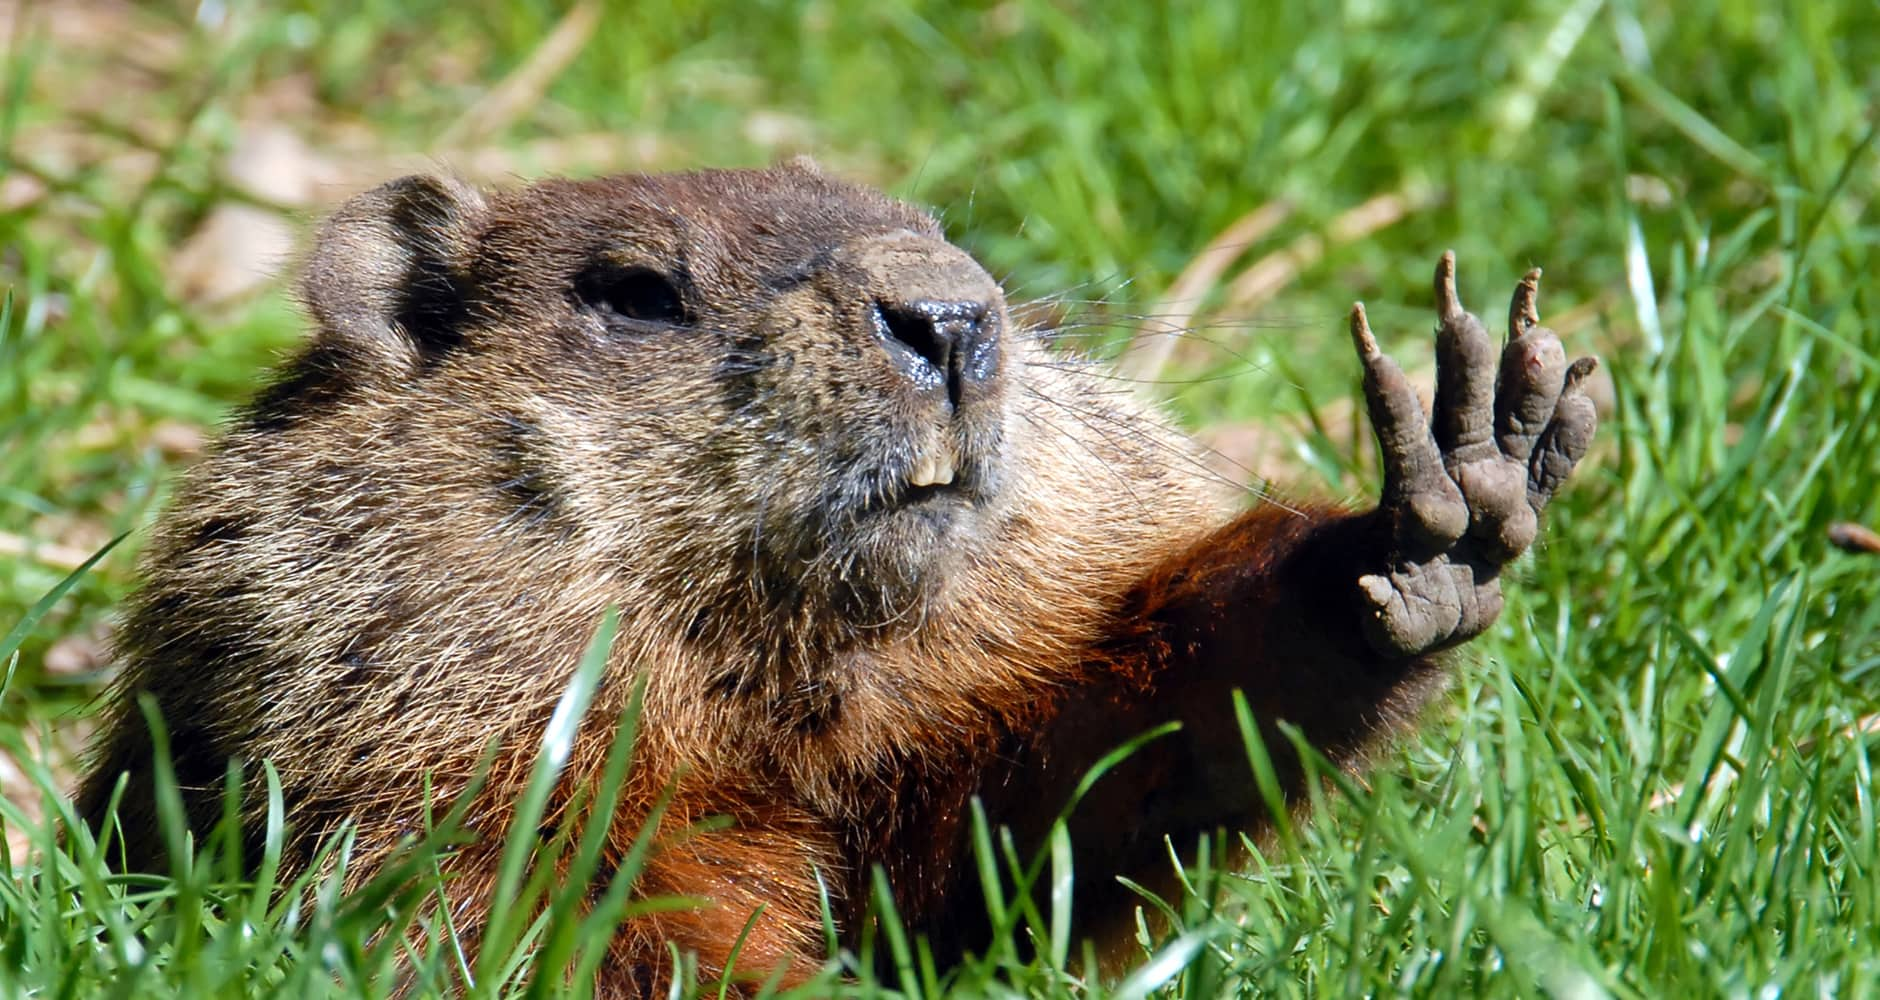 groundhog day folklore